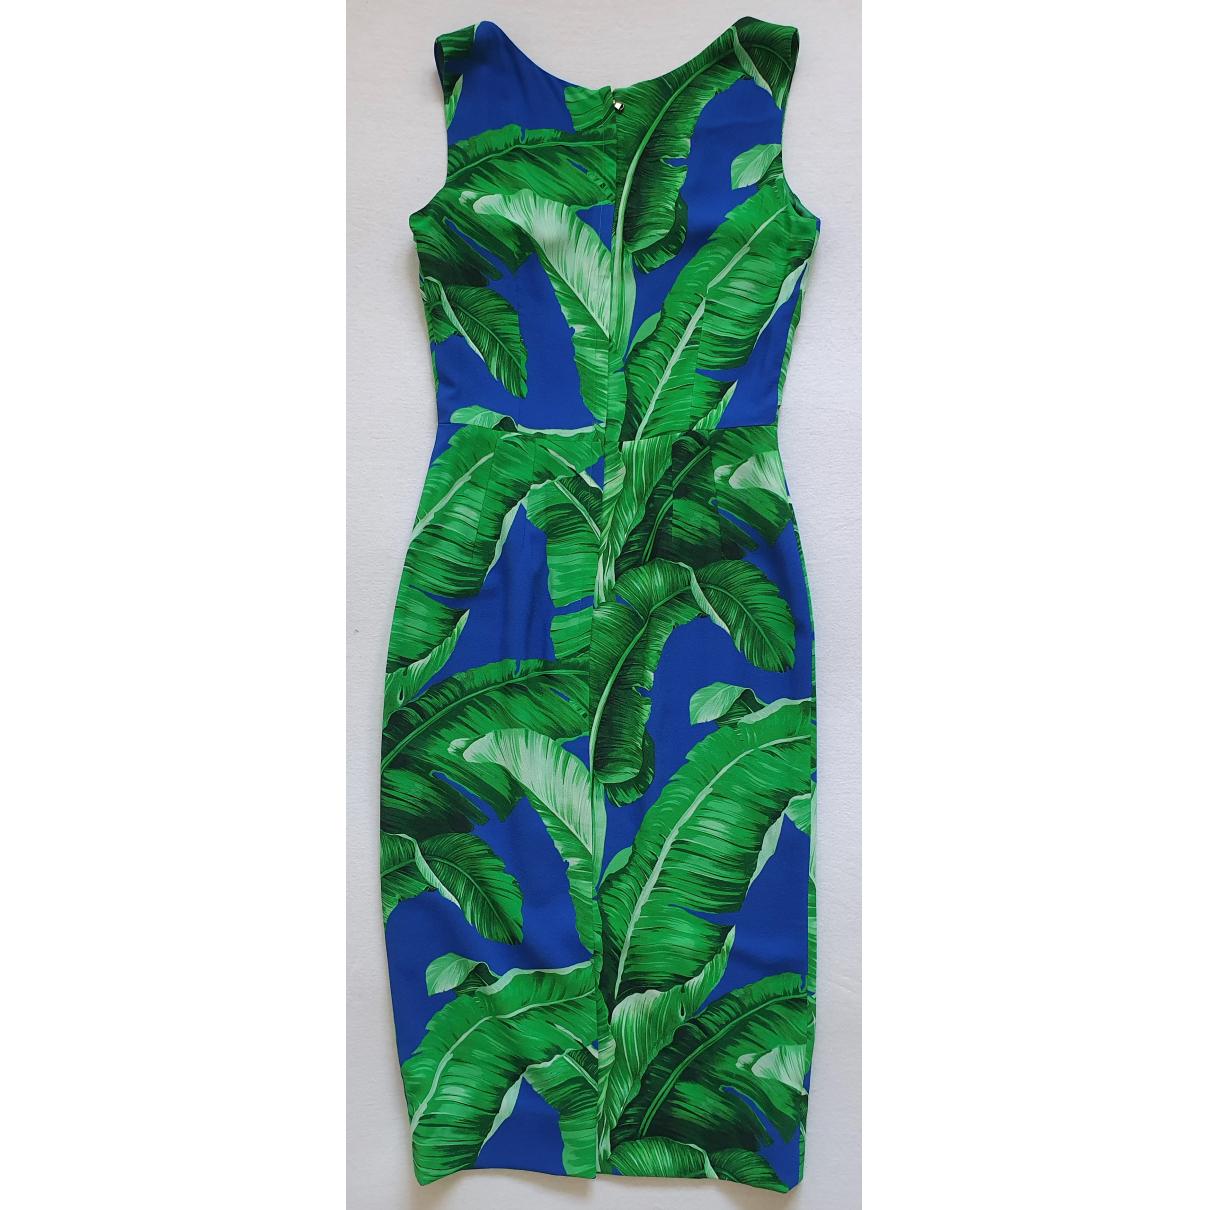 Dolce & Gabbana \N Green dress for Women 38 IT